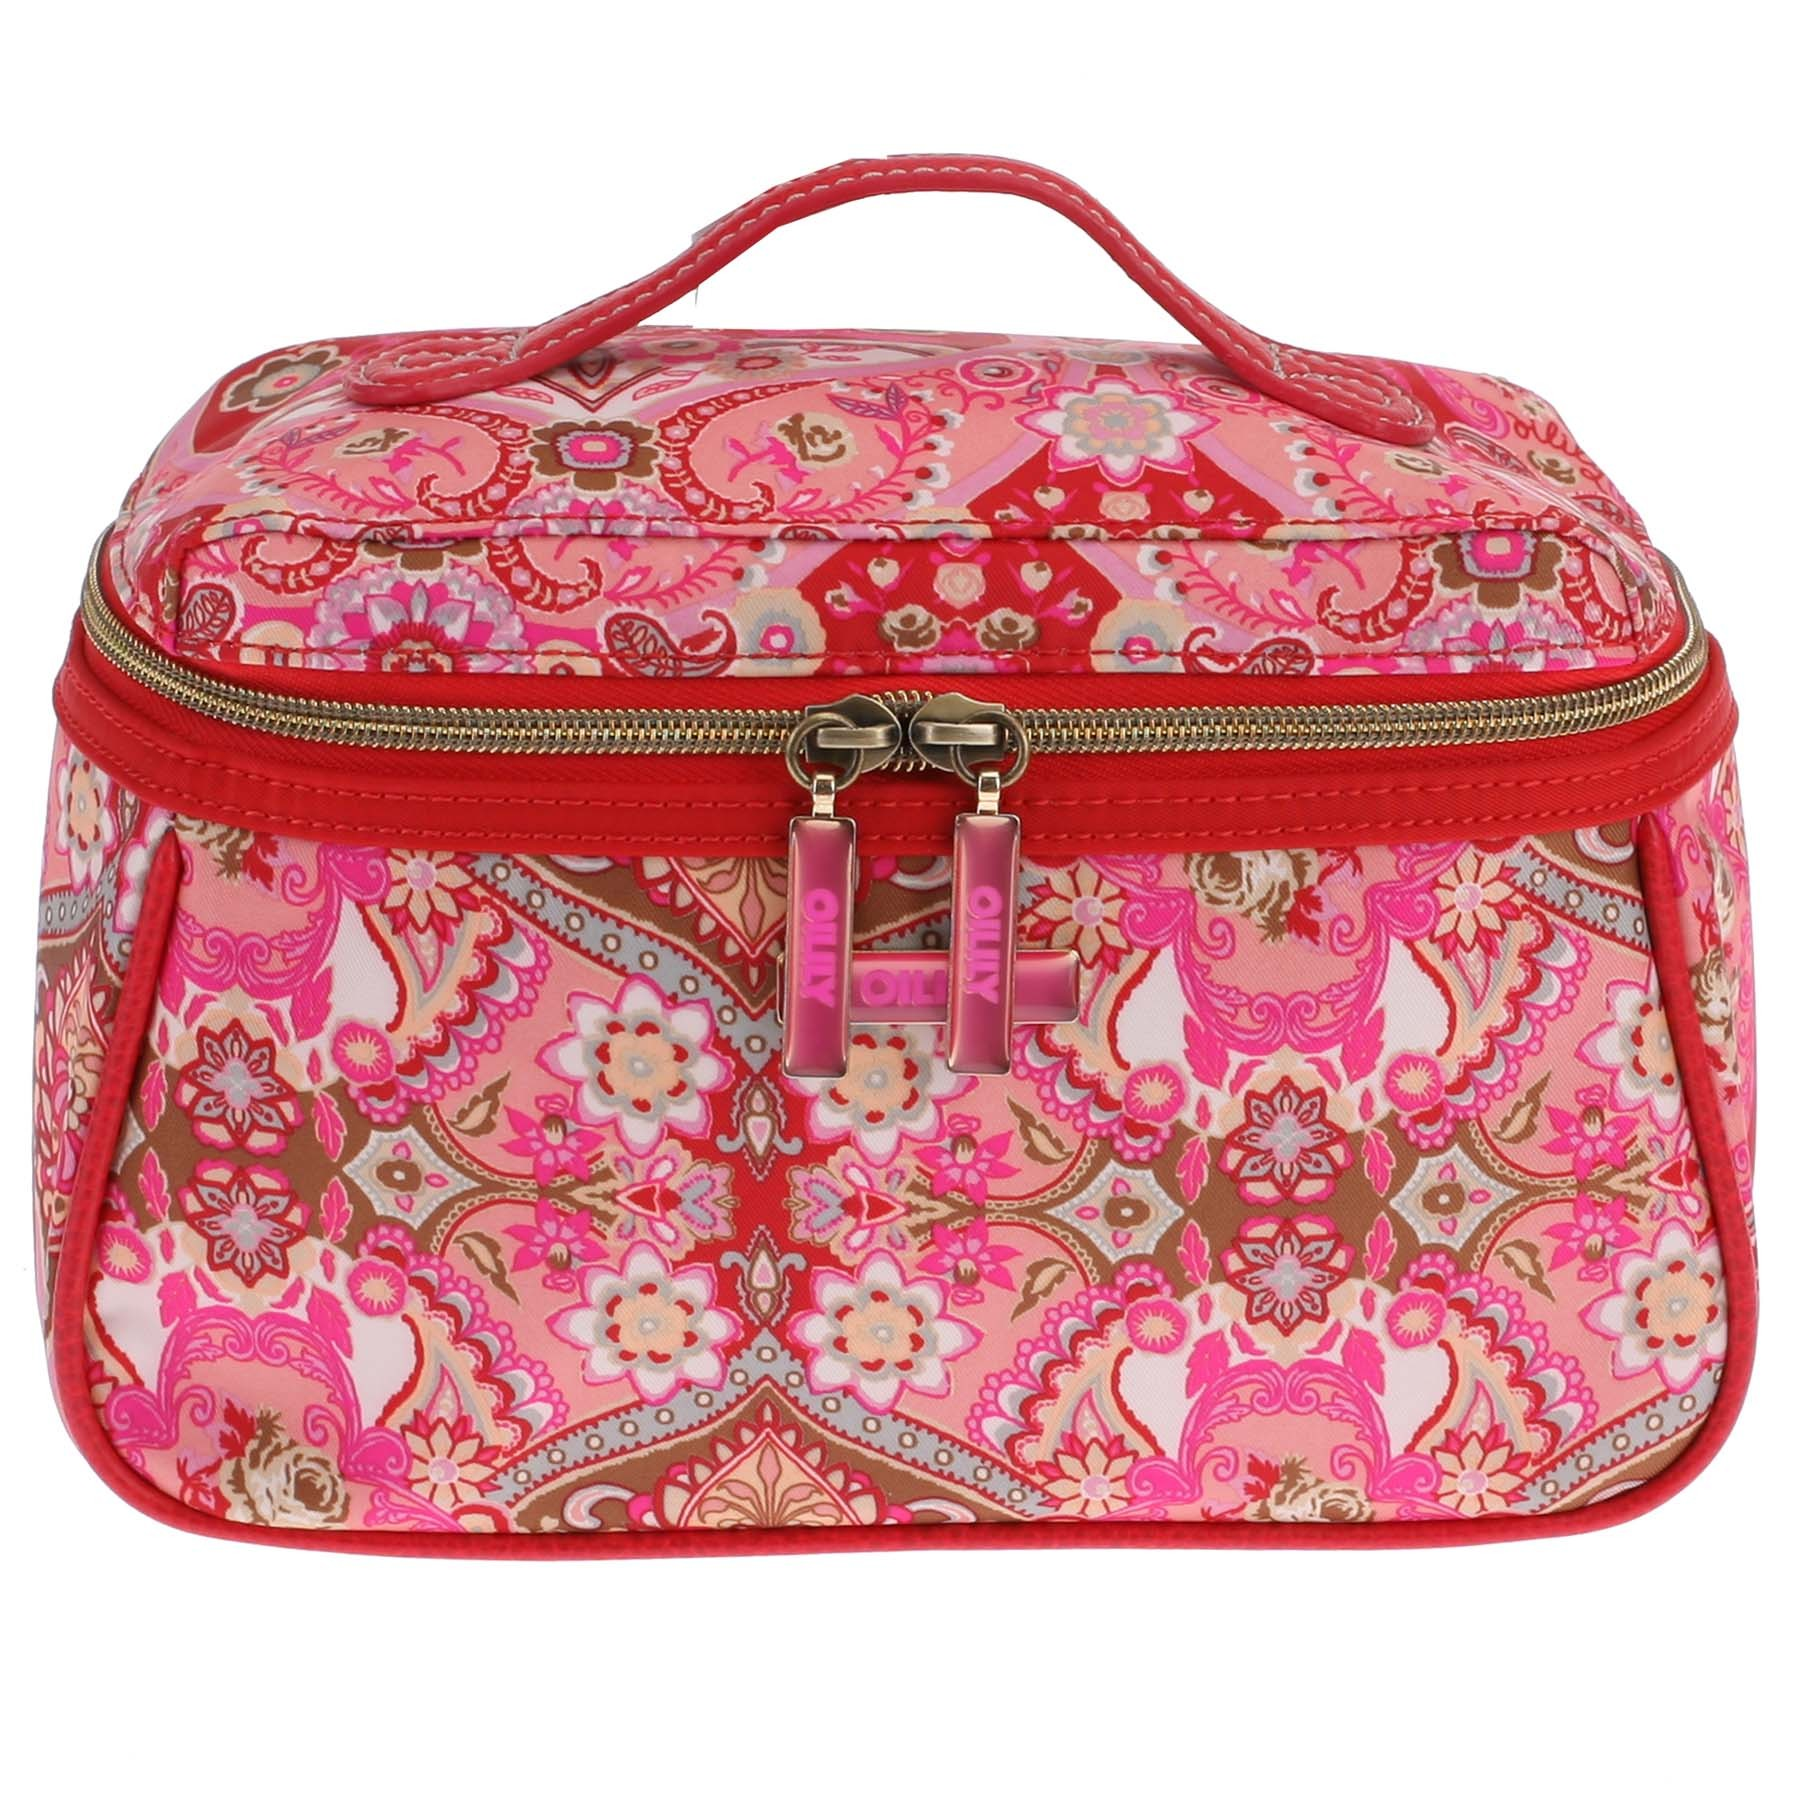 oilily summer mosaic kosmetiktasche m beauty case strawberry ebay. Black Bedroom Furniture Sets. Home Design Ideas